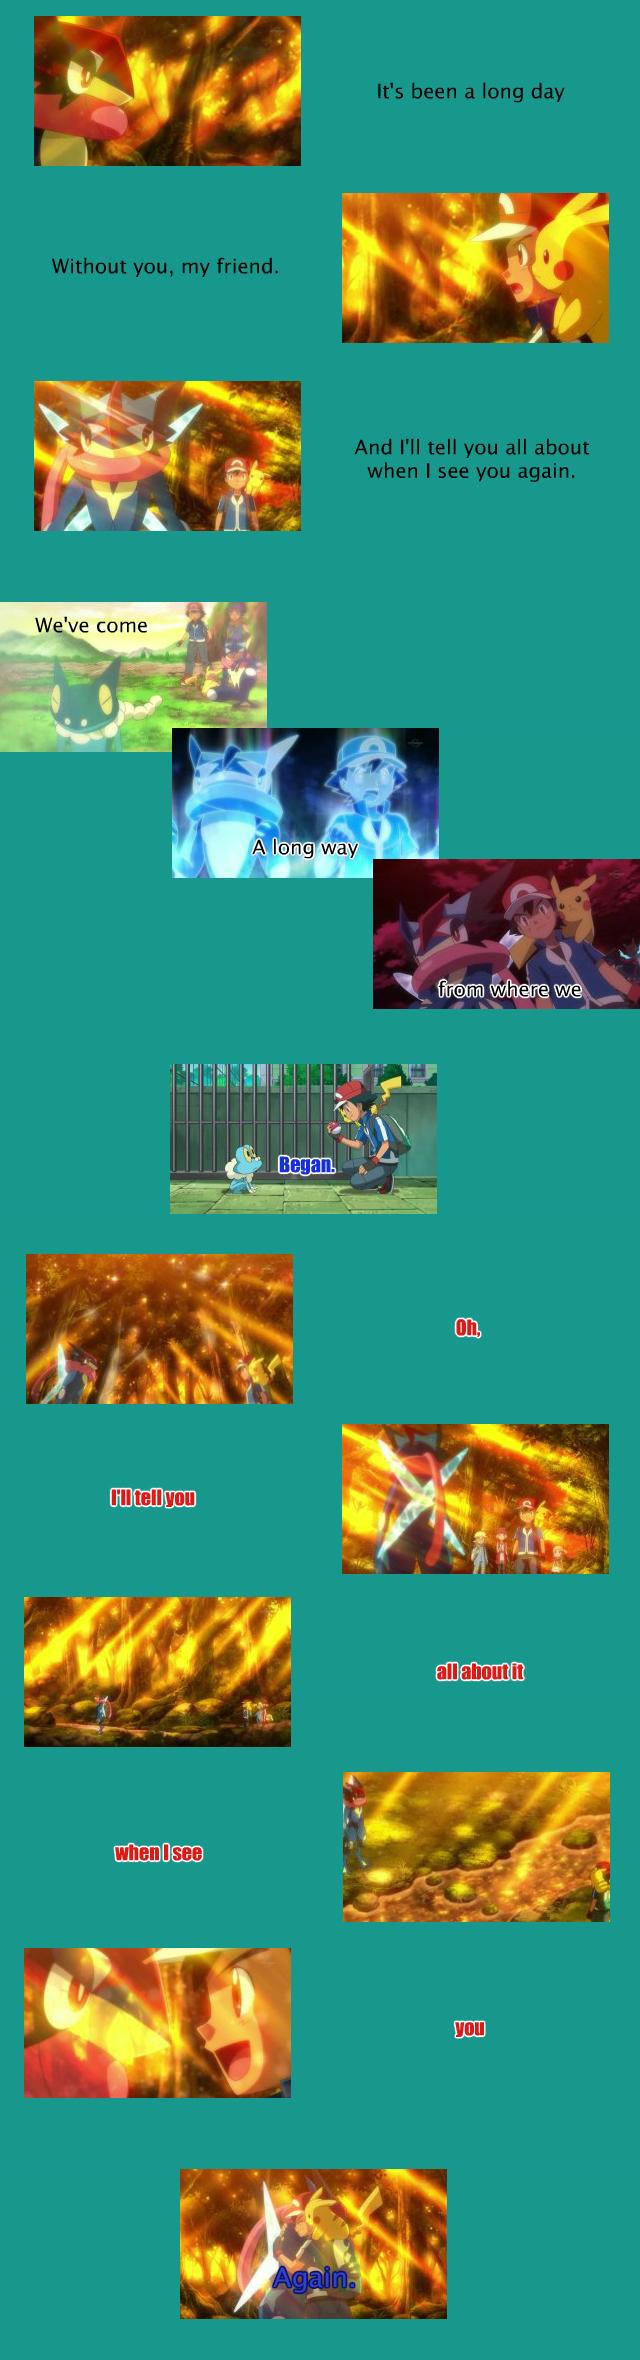 we will meet again pokemon lyrics in spanish